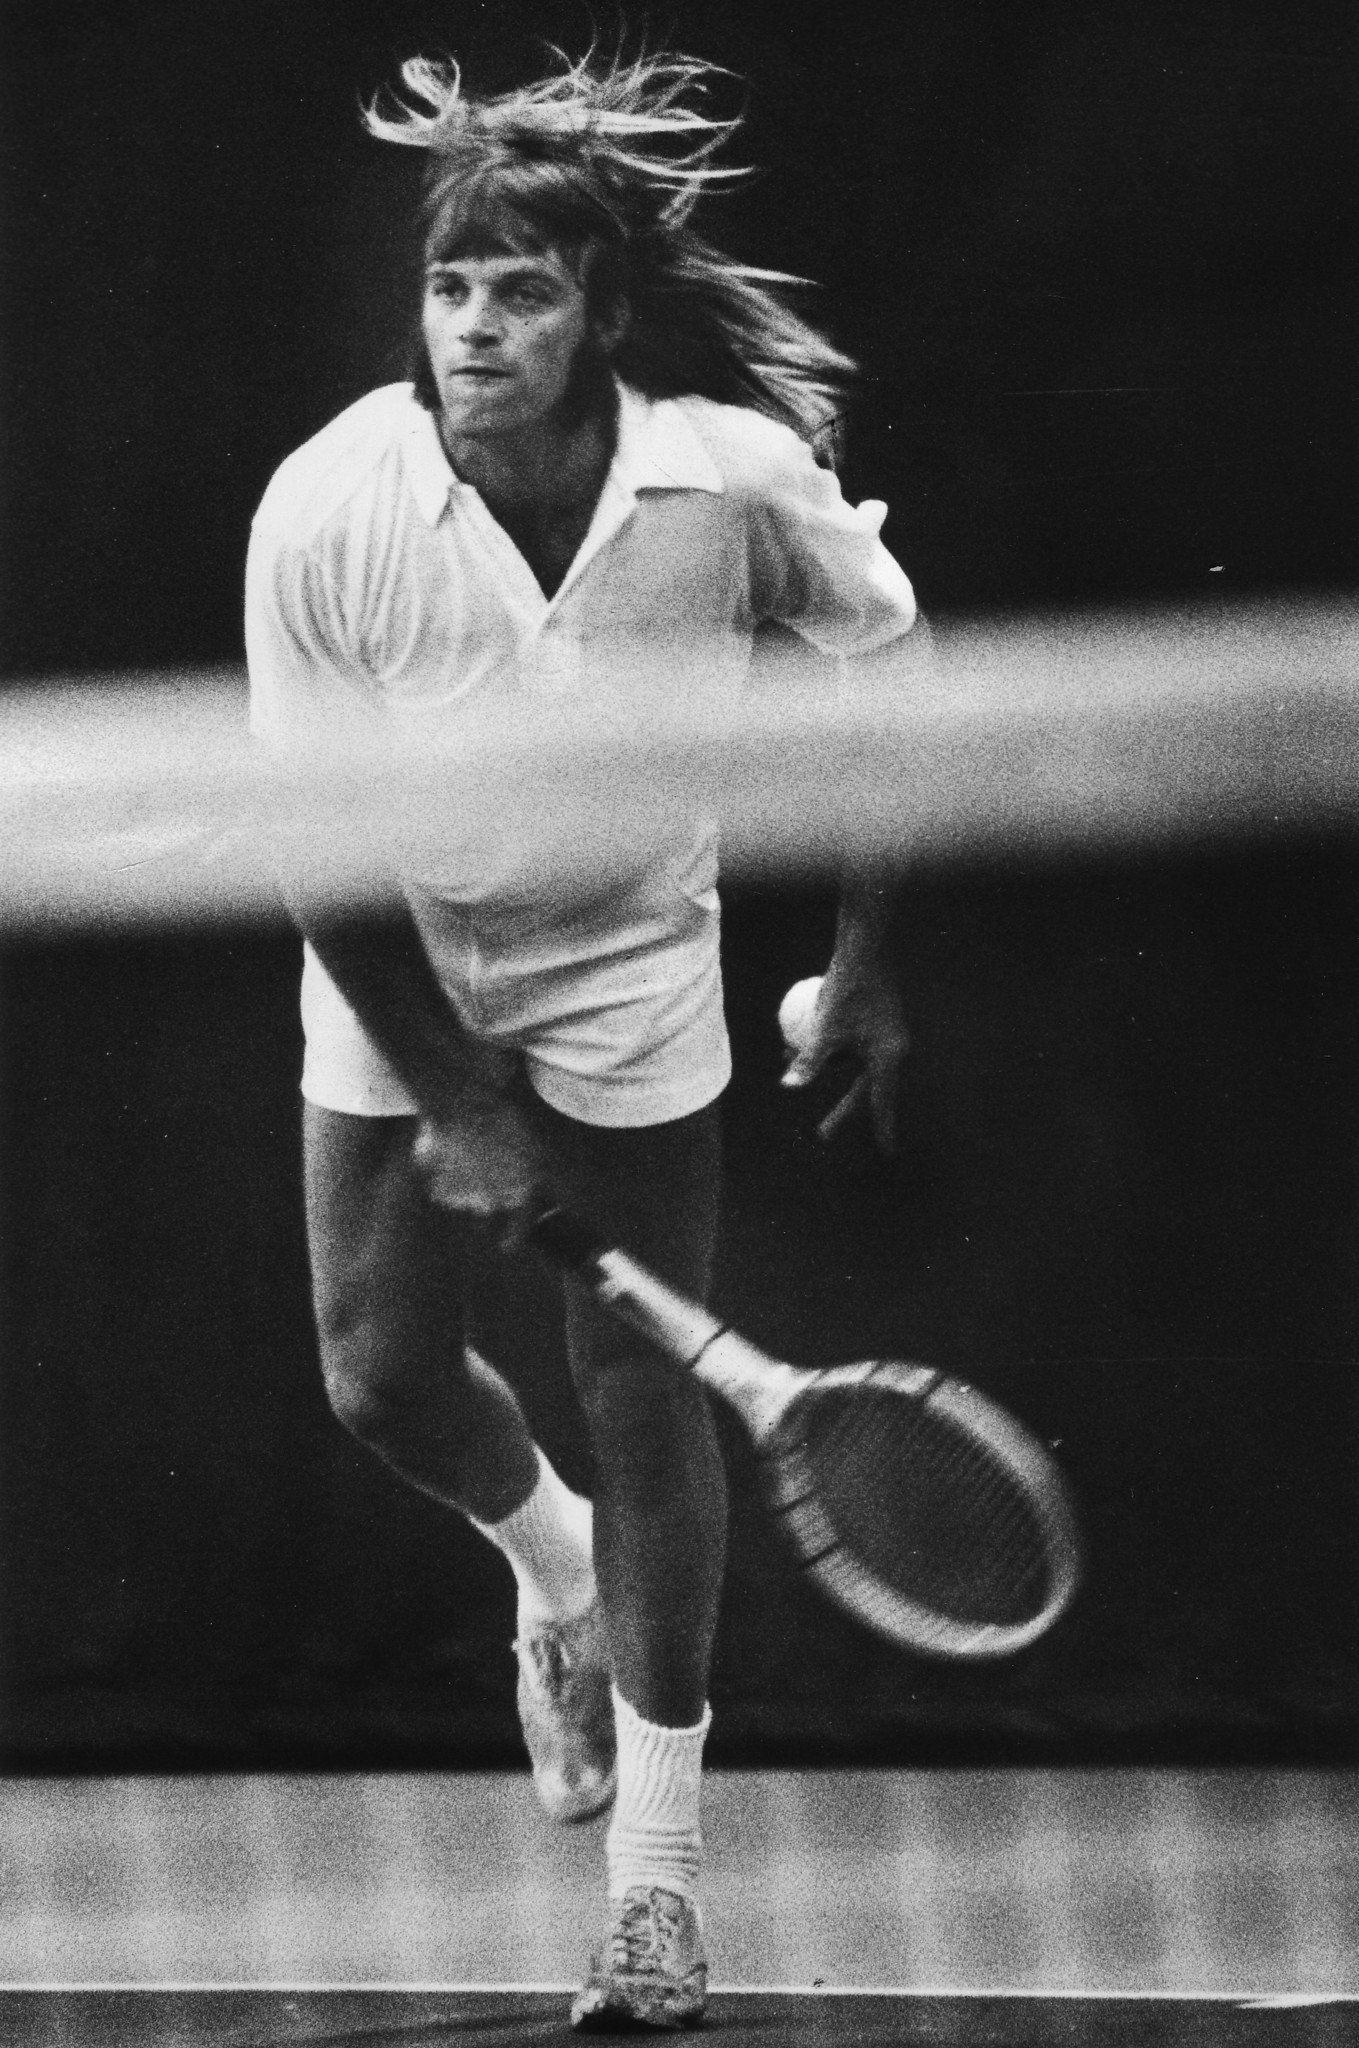 Steve Docherty Docherty Was An Australian Tennis Player Who Had Minor Success In Men S Doubles In The Late 1970 Tennis Hair Australian Tennis Players Tennis